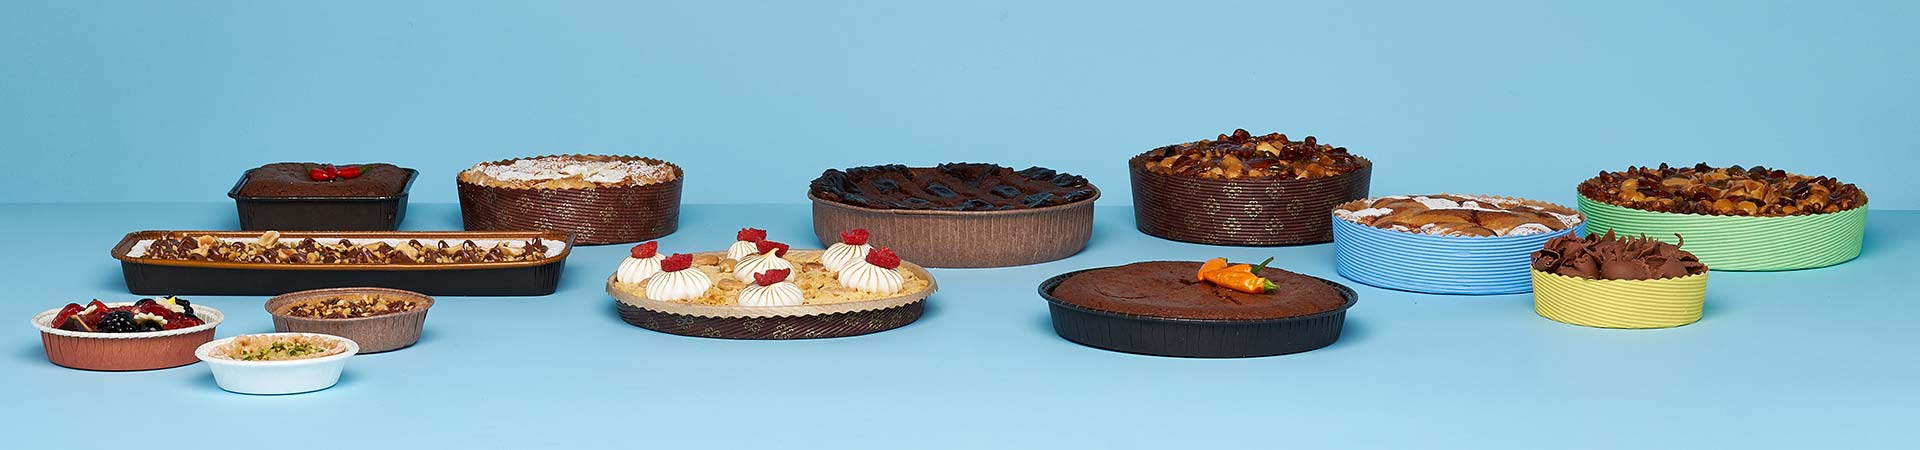 Novacart pies paper baking molds